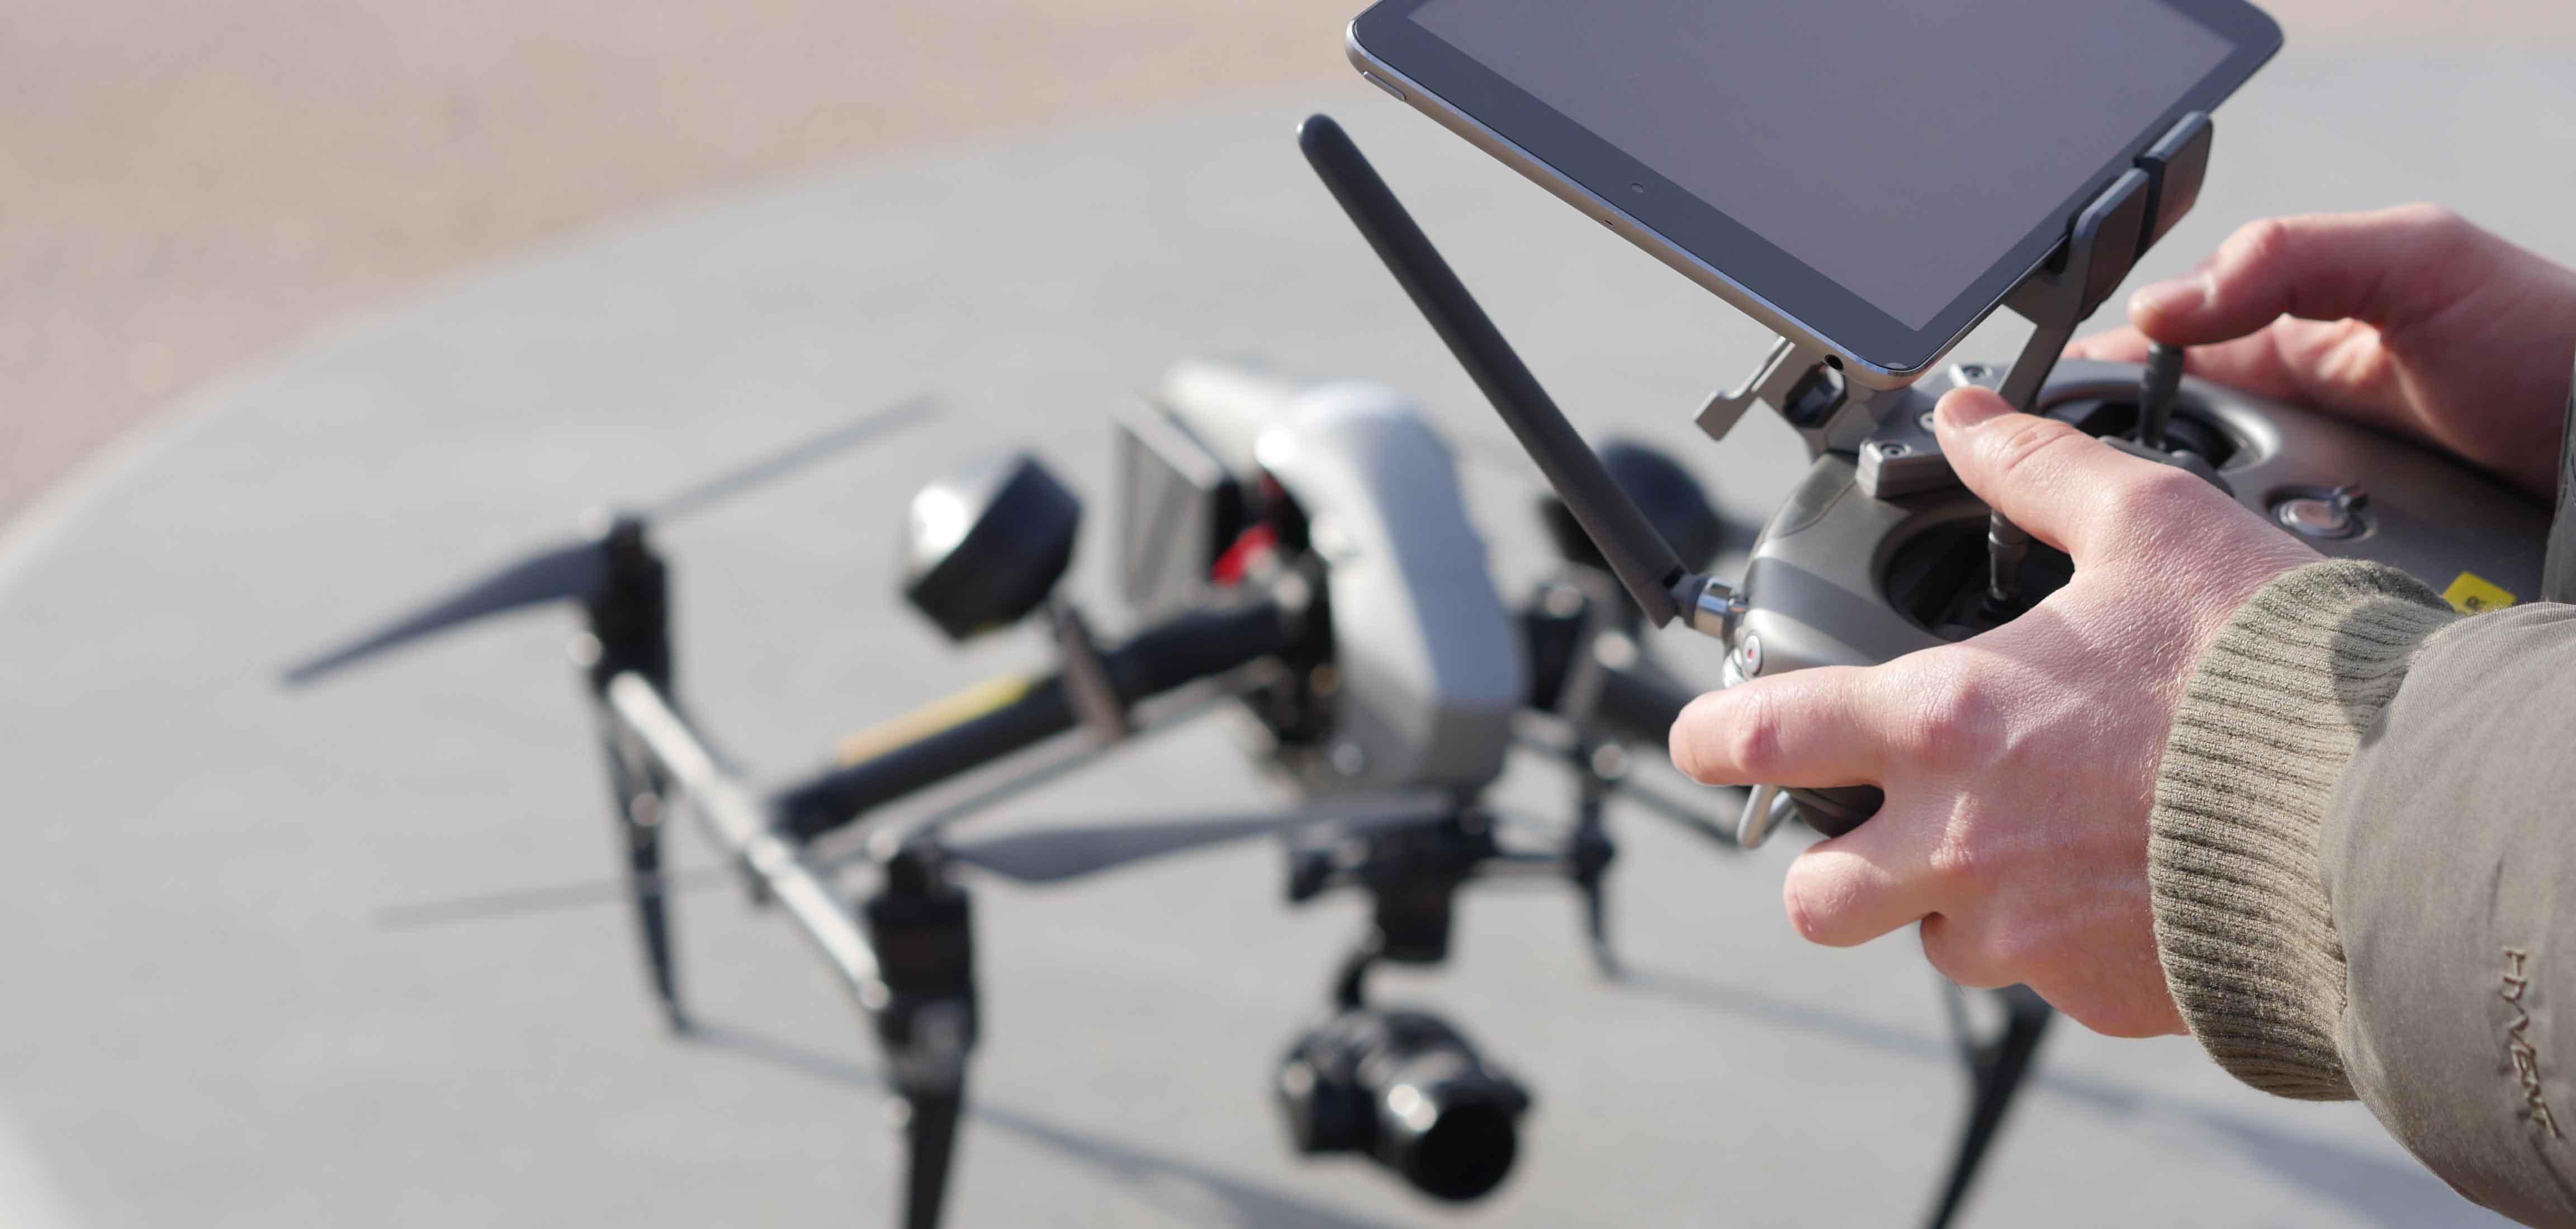 Drone a Lyon et pilote